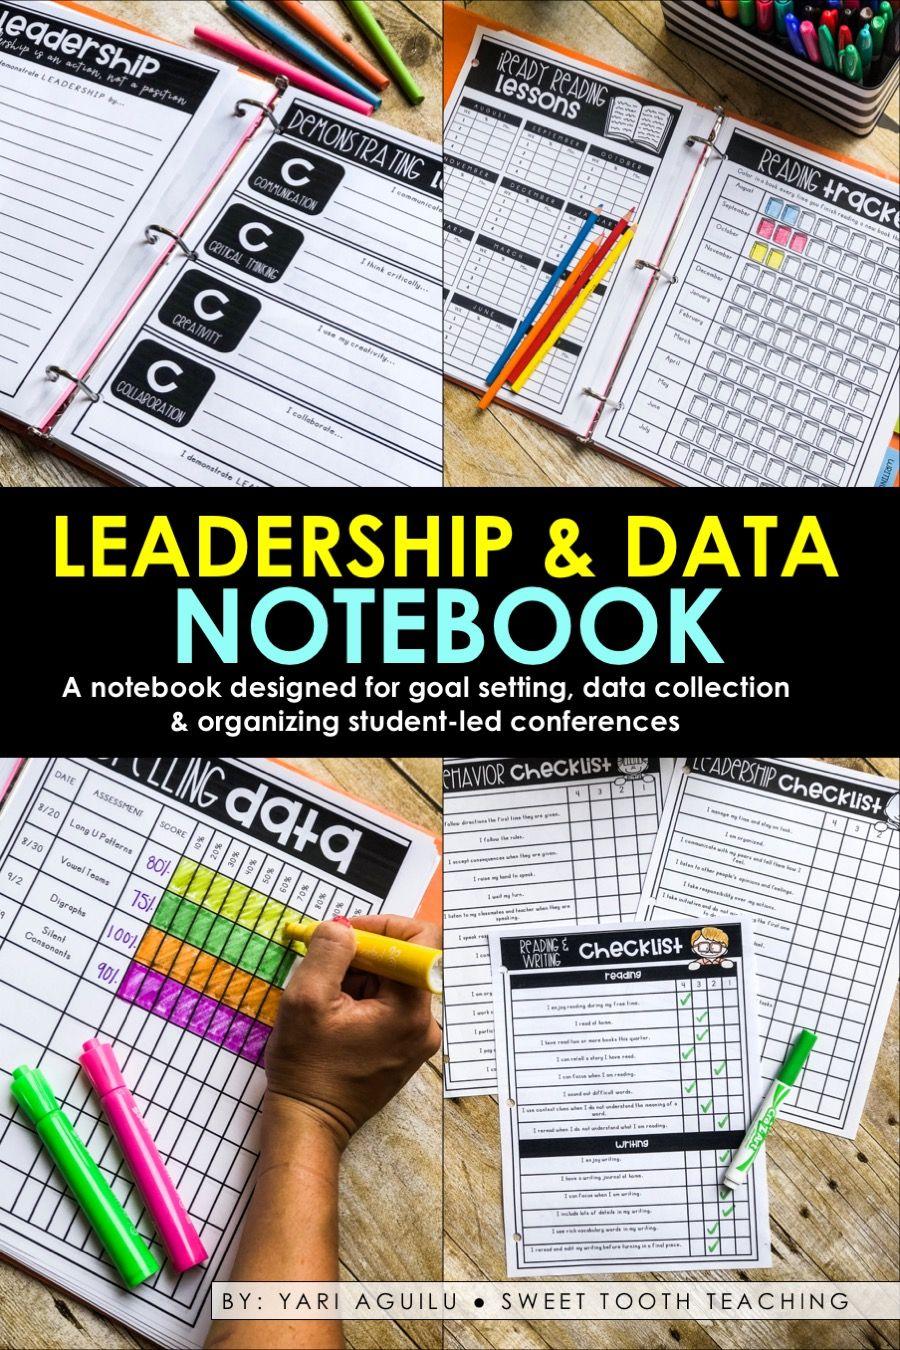 Leadership & Data Notebook | Data notebooks, Student data ...